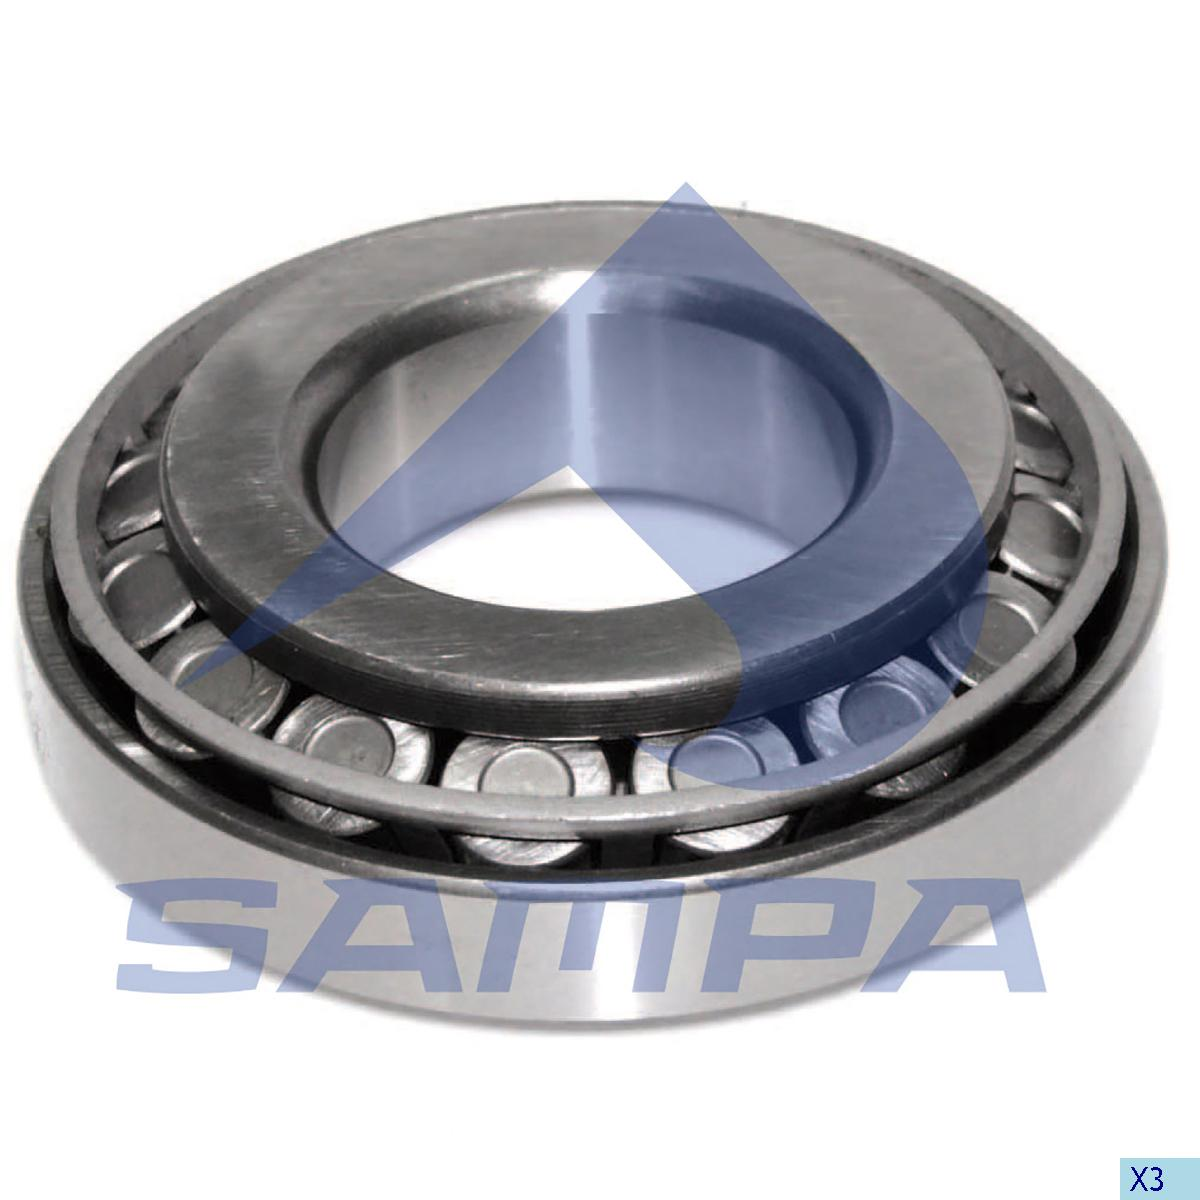 Bearing, Crown Wheel & Pinion, Mercedes, Power Unit